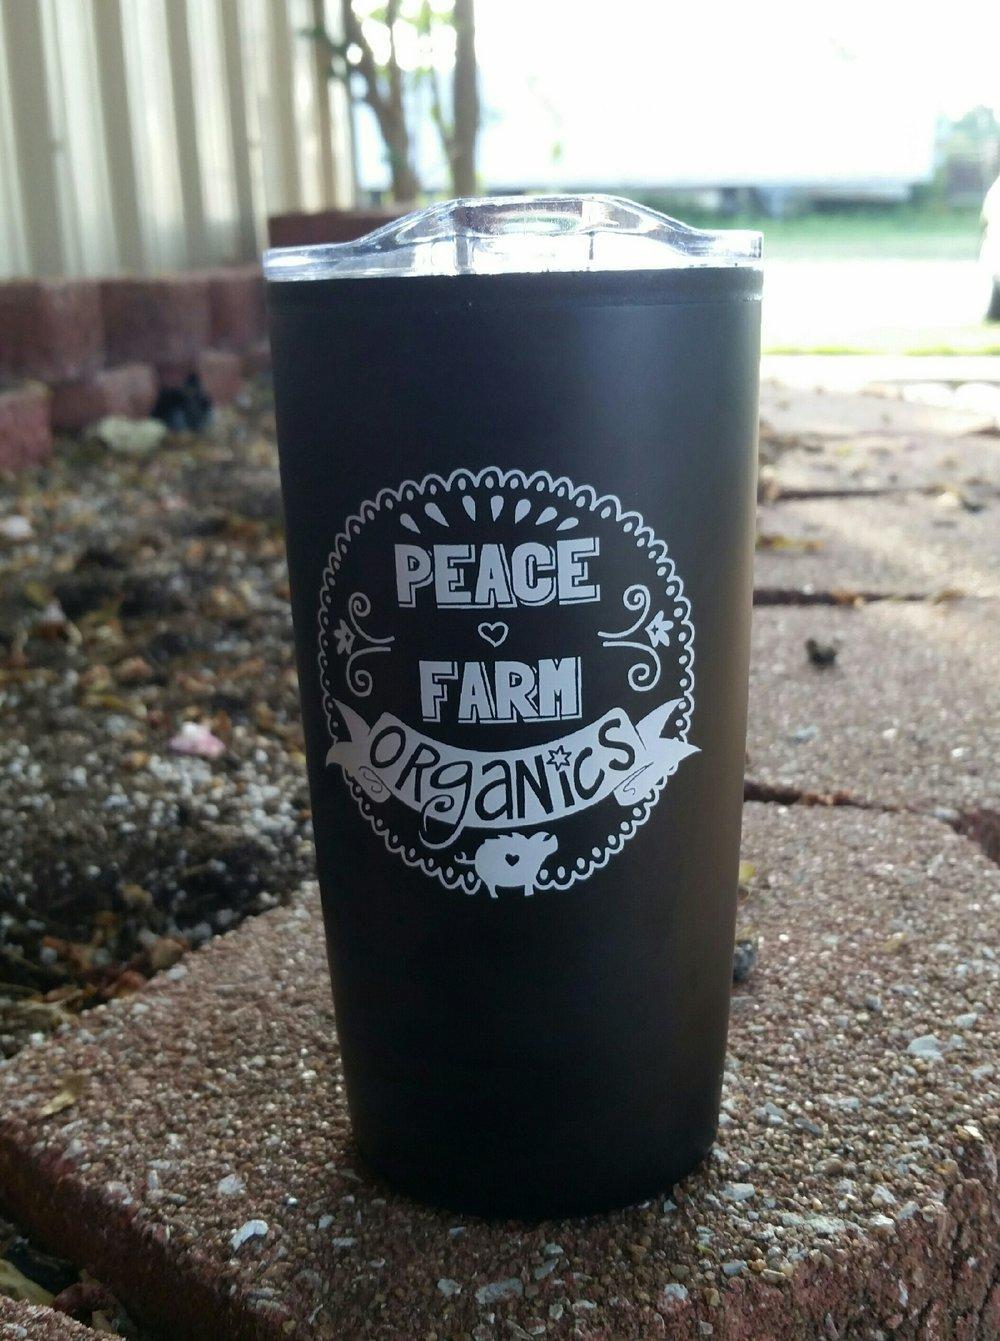 Peace Farm Promotional Tumbler (Non-organic material) - $19.99